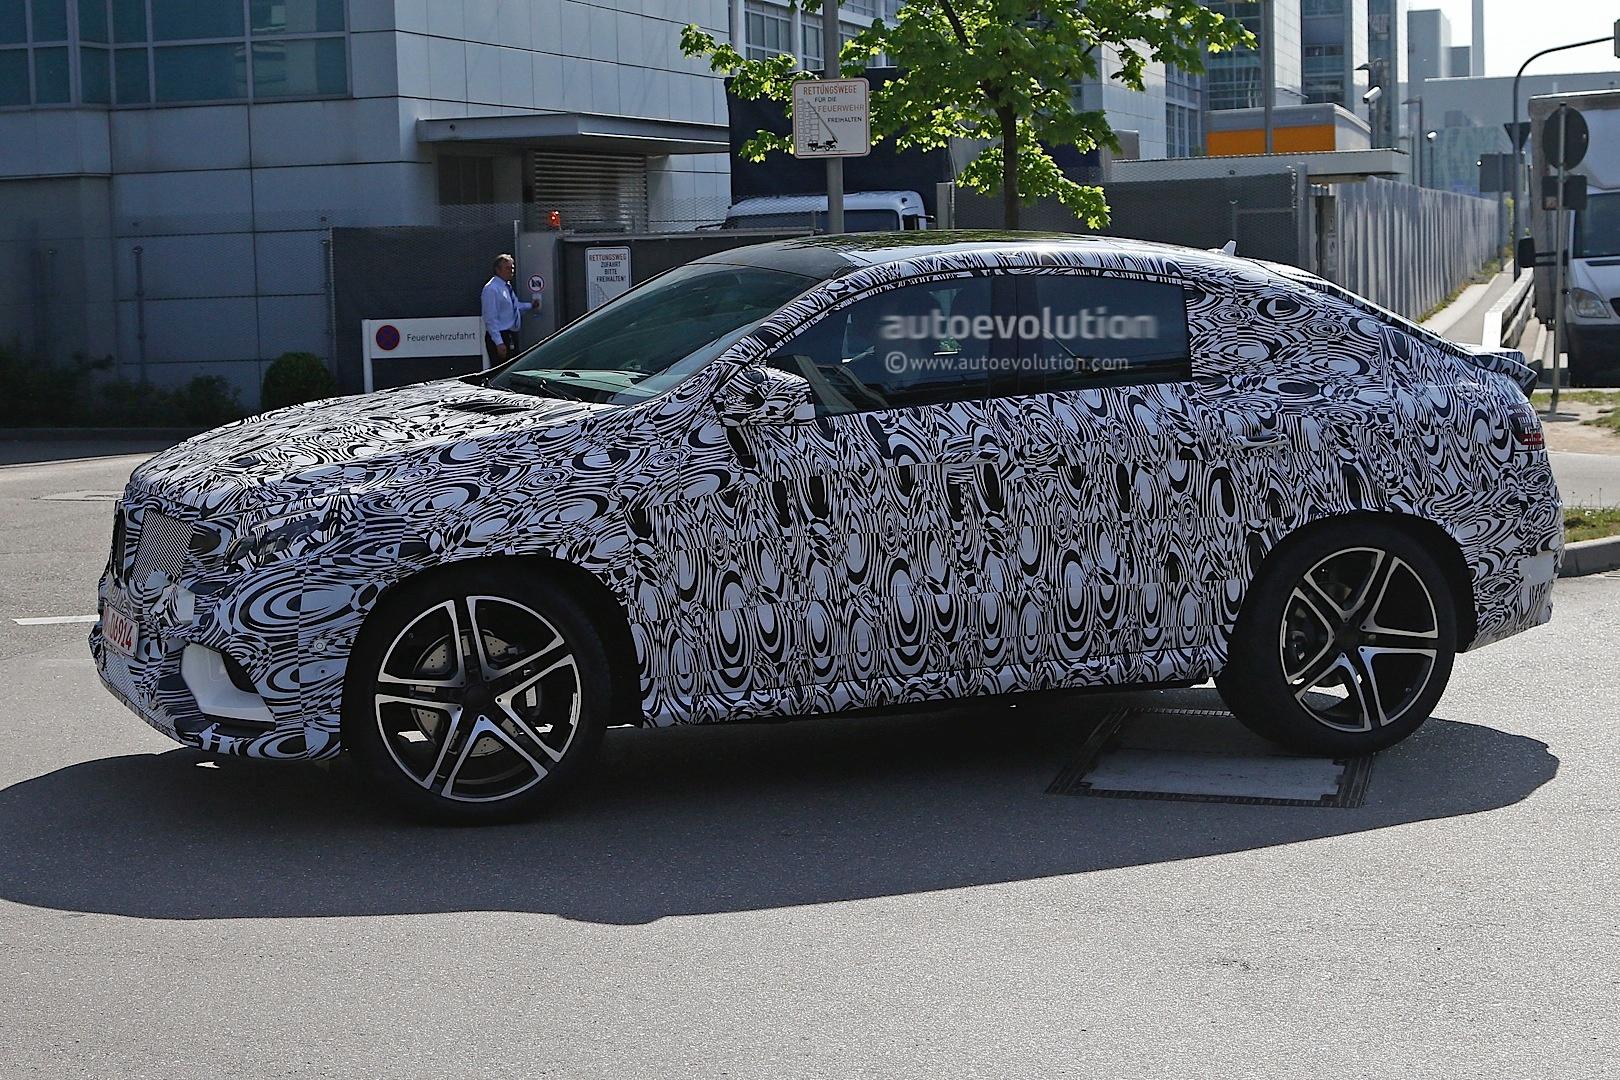 2015 Mercedes Benz Mlc Vs 2015 Bmw X6 Spyshots Autoevolution